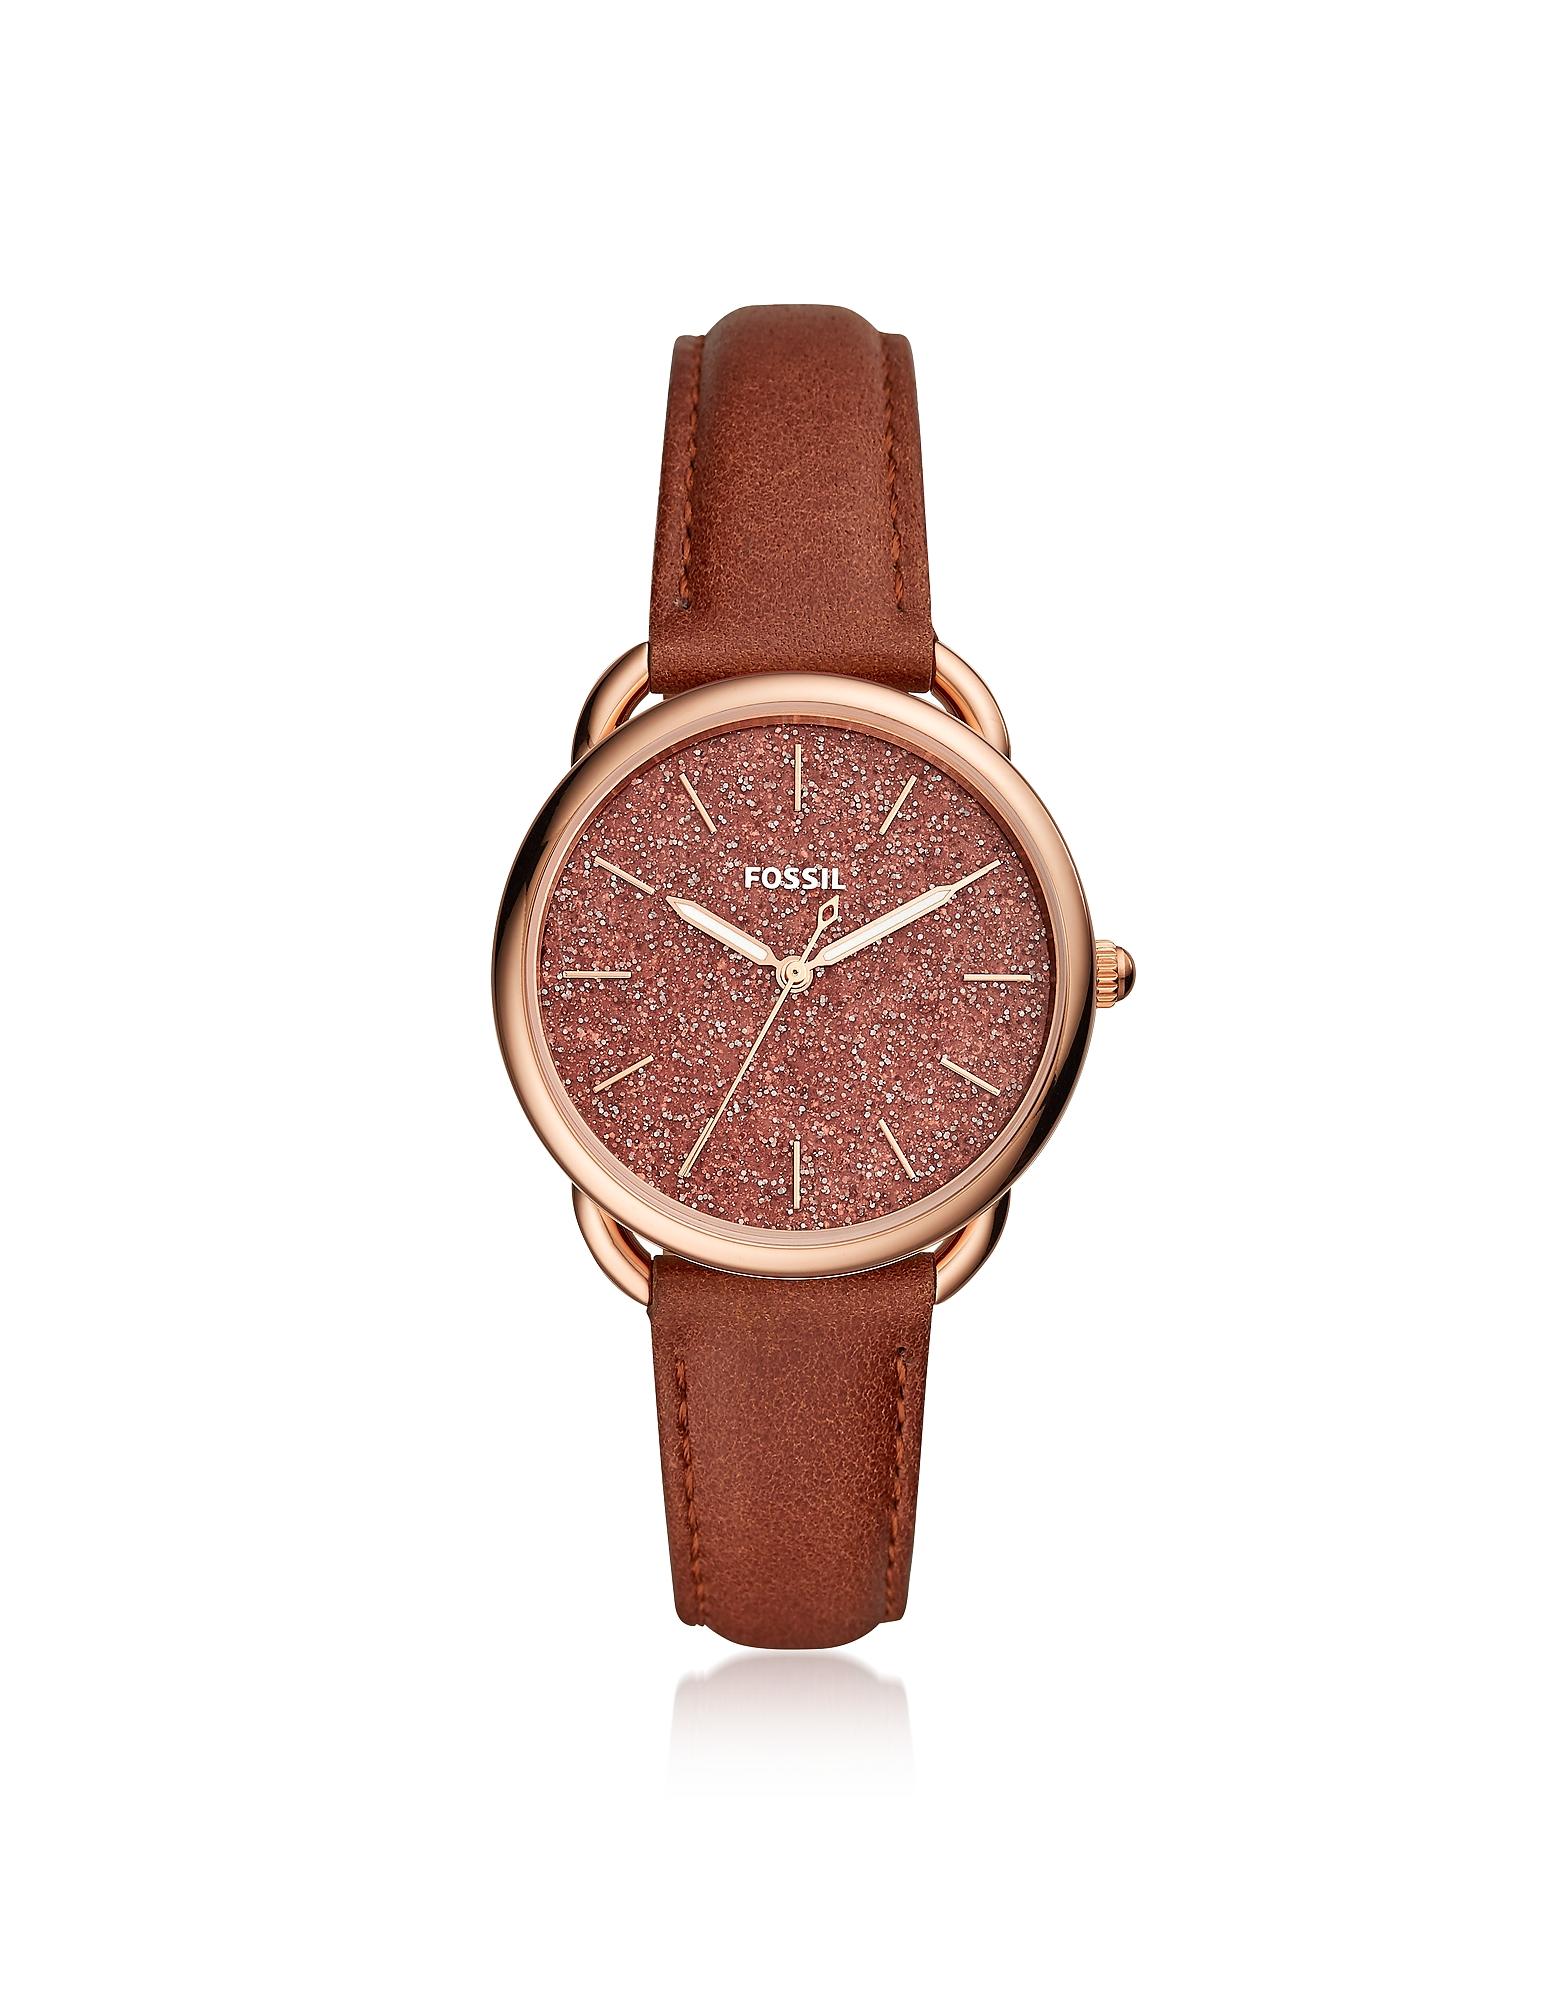 Fossil Women's Watches, Tailor Three Hand Terracotta Women's Watch